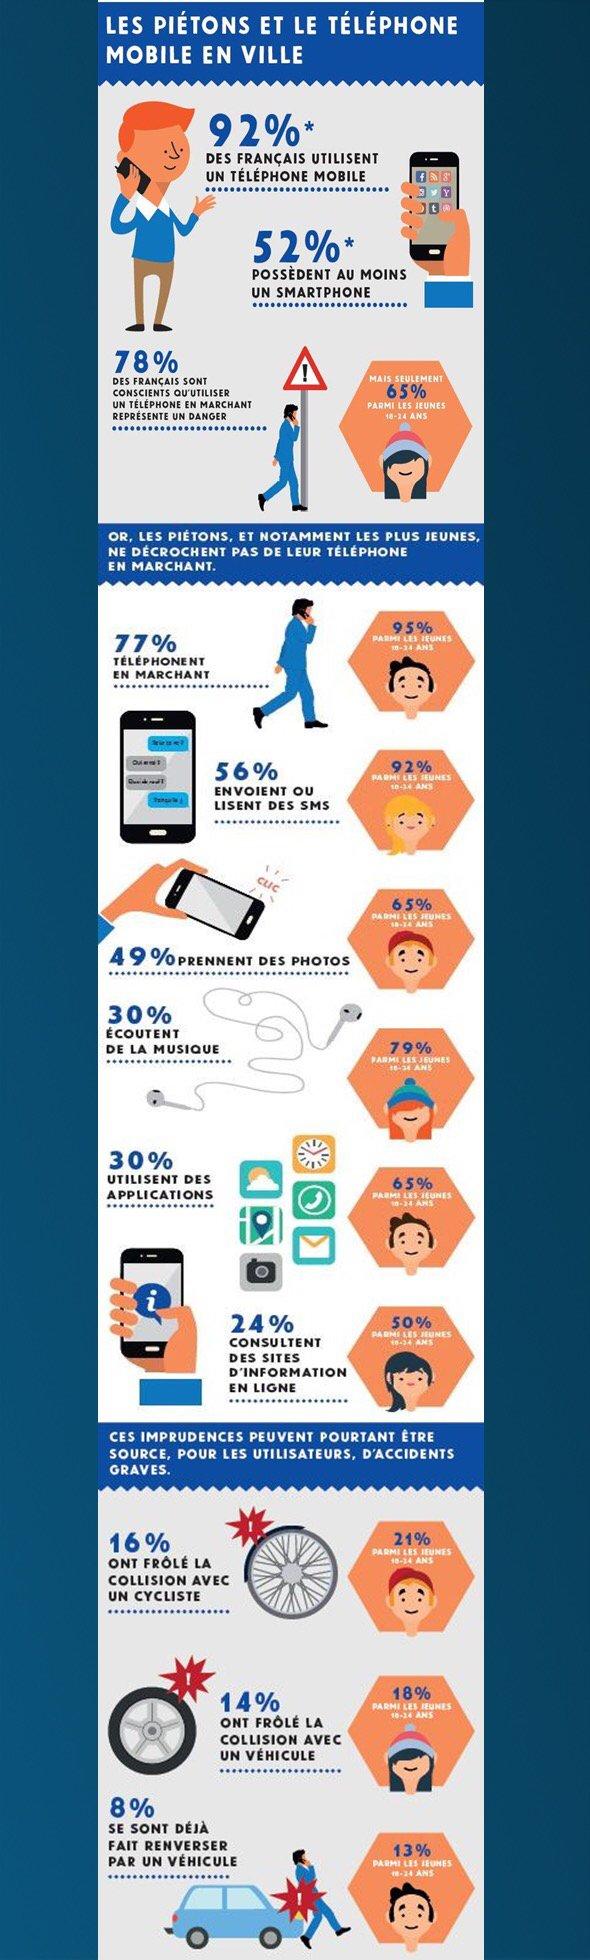 infographie gfm pieton smartphone